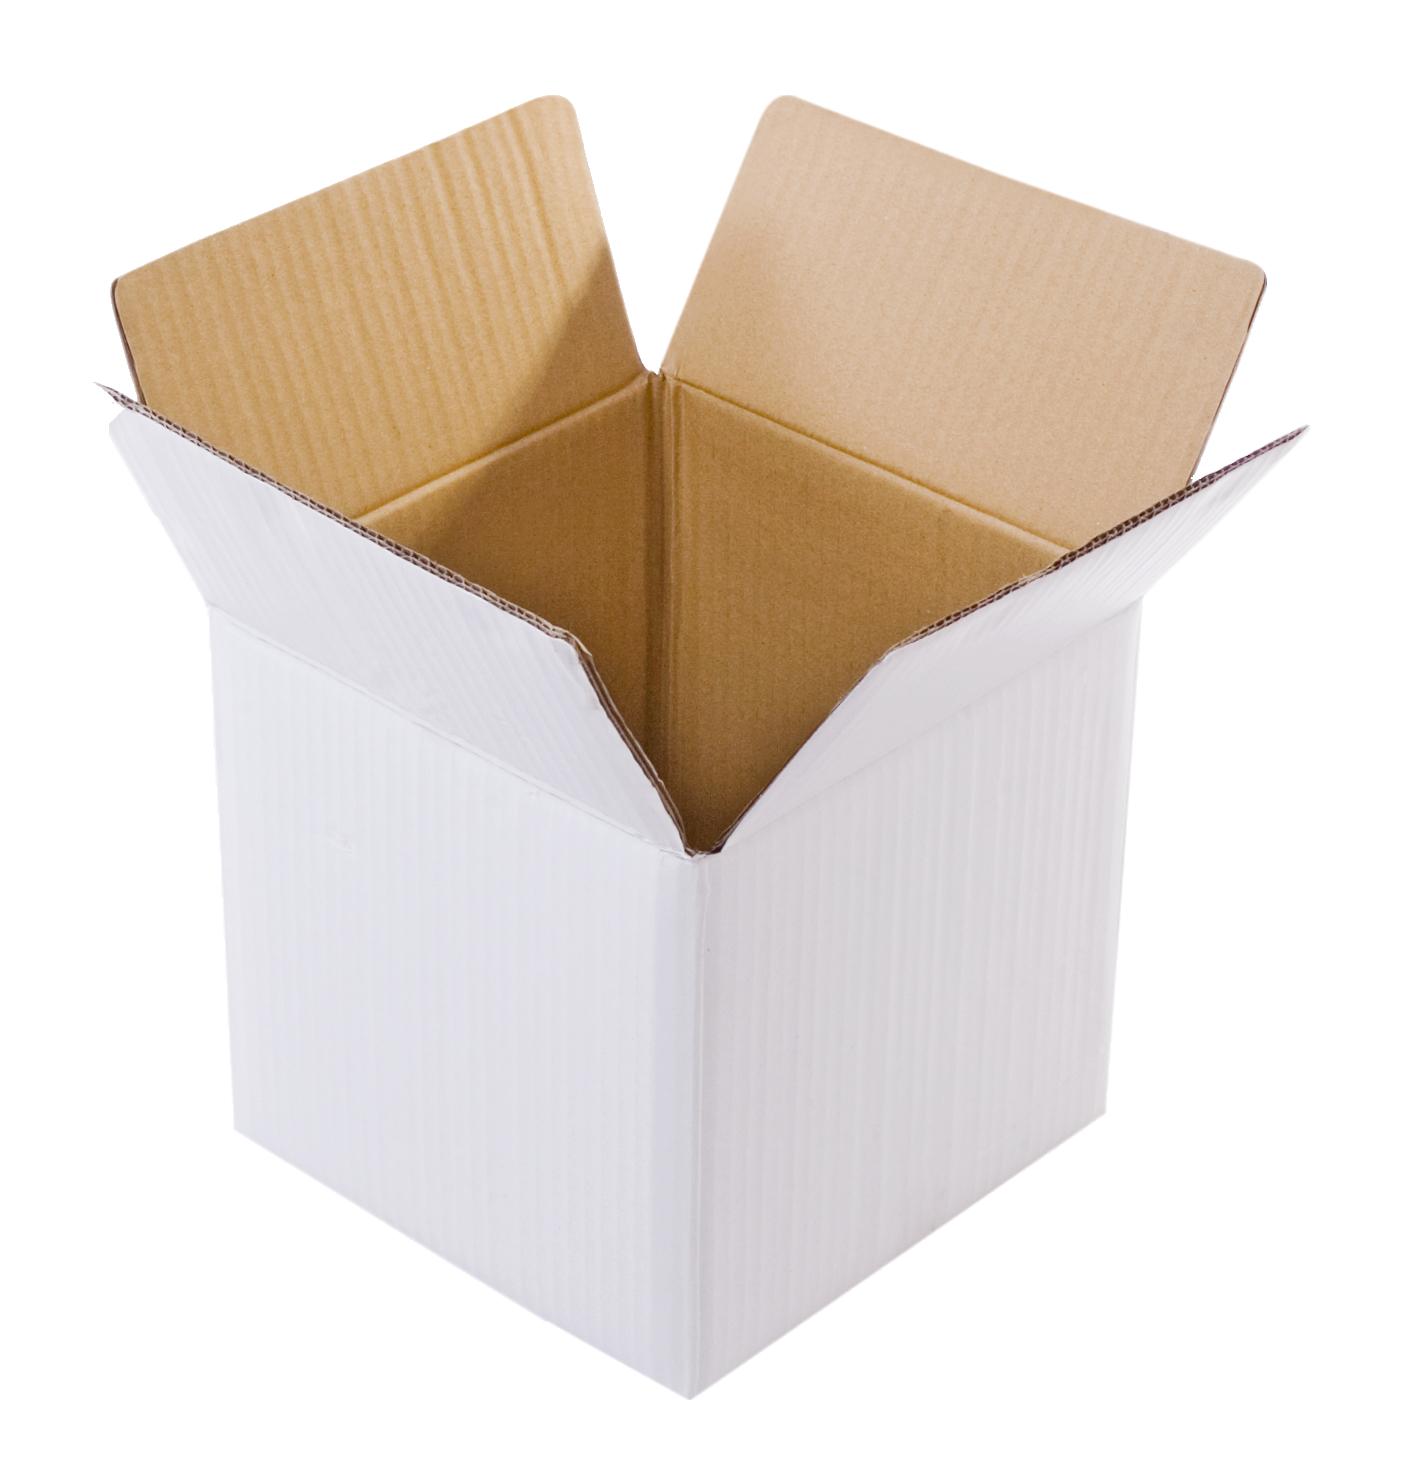 White Cube Box, 5Ply